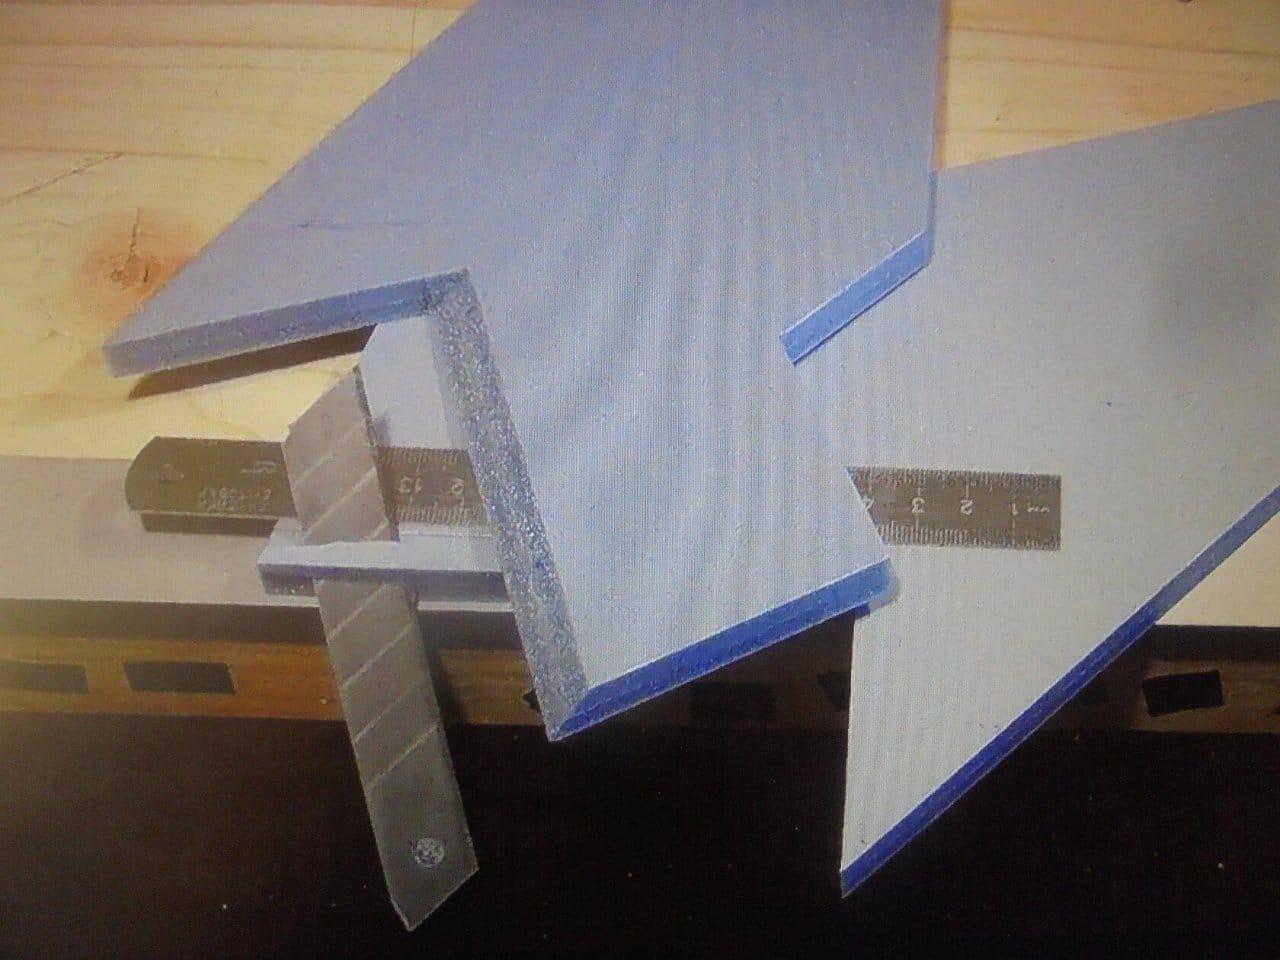 Seaplane STRIZH - Seaplane STRIZH from underlay for laminate